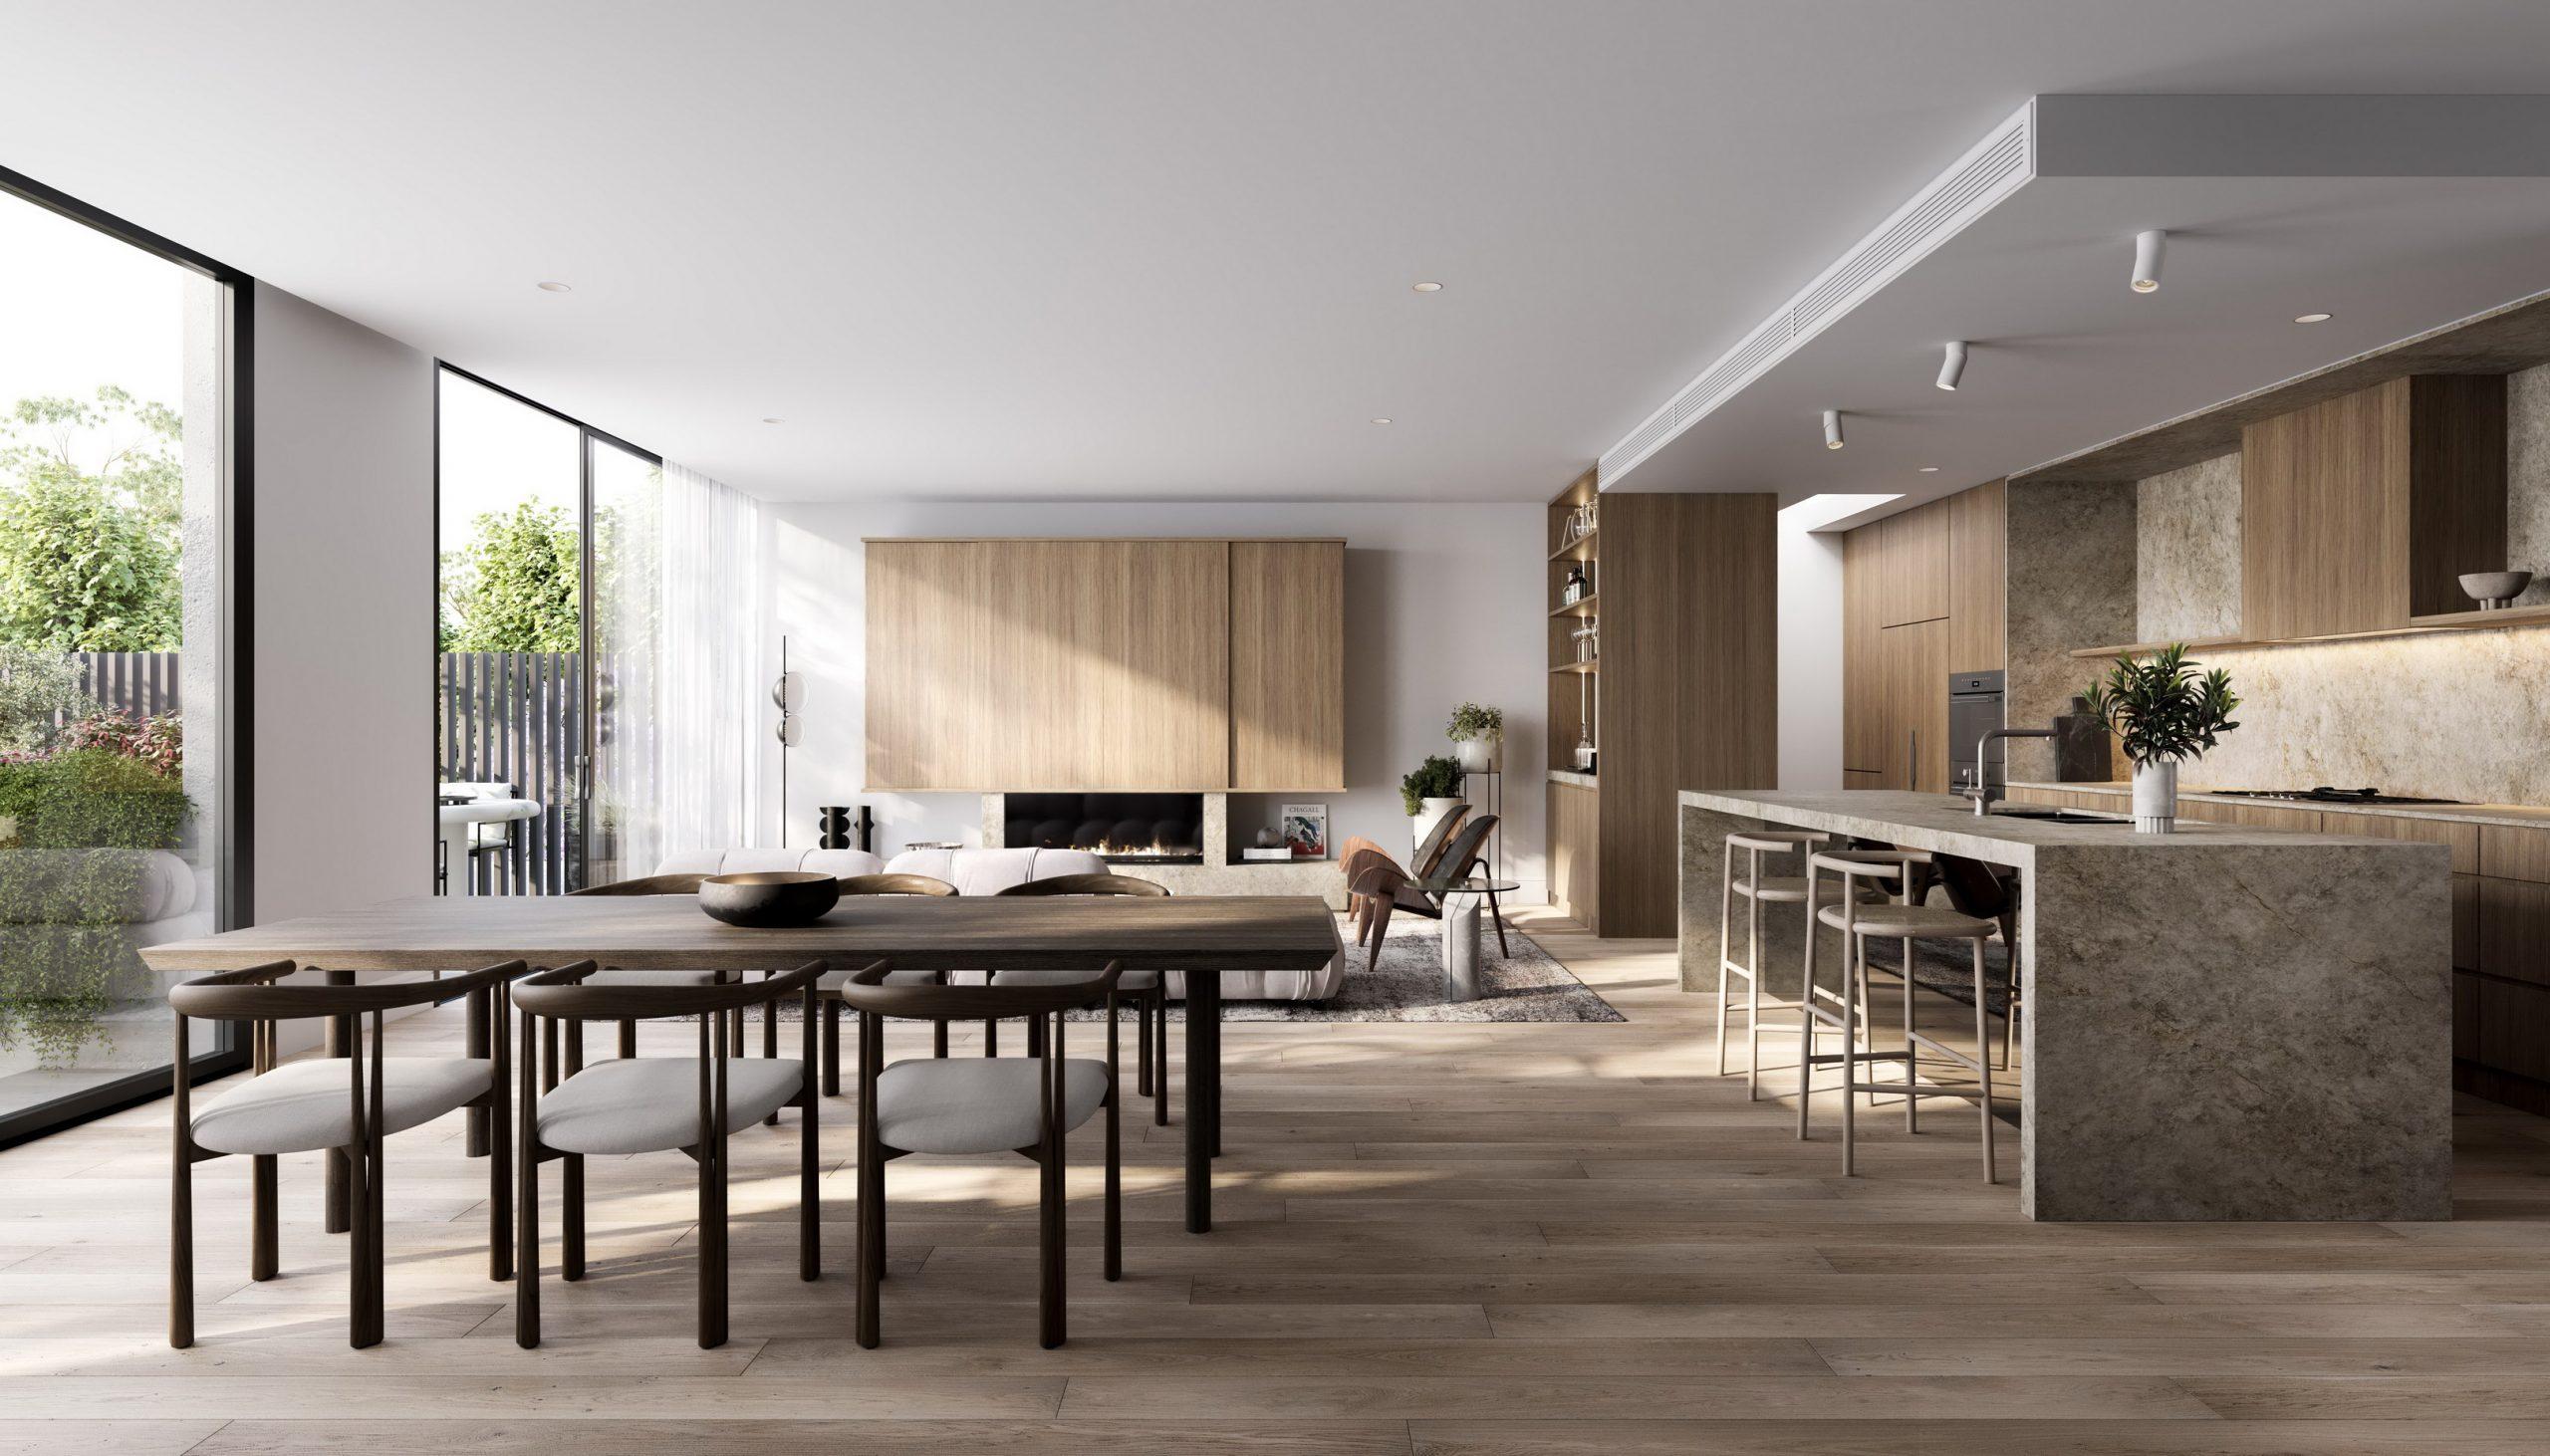 fkd-studio-3d-archiecture-visualisation-cgi-archviz-eaglemont-interior-livingroom